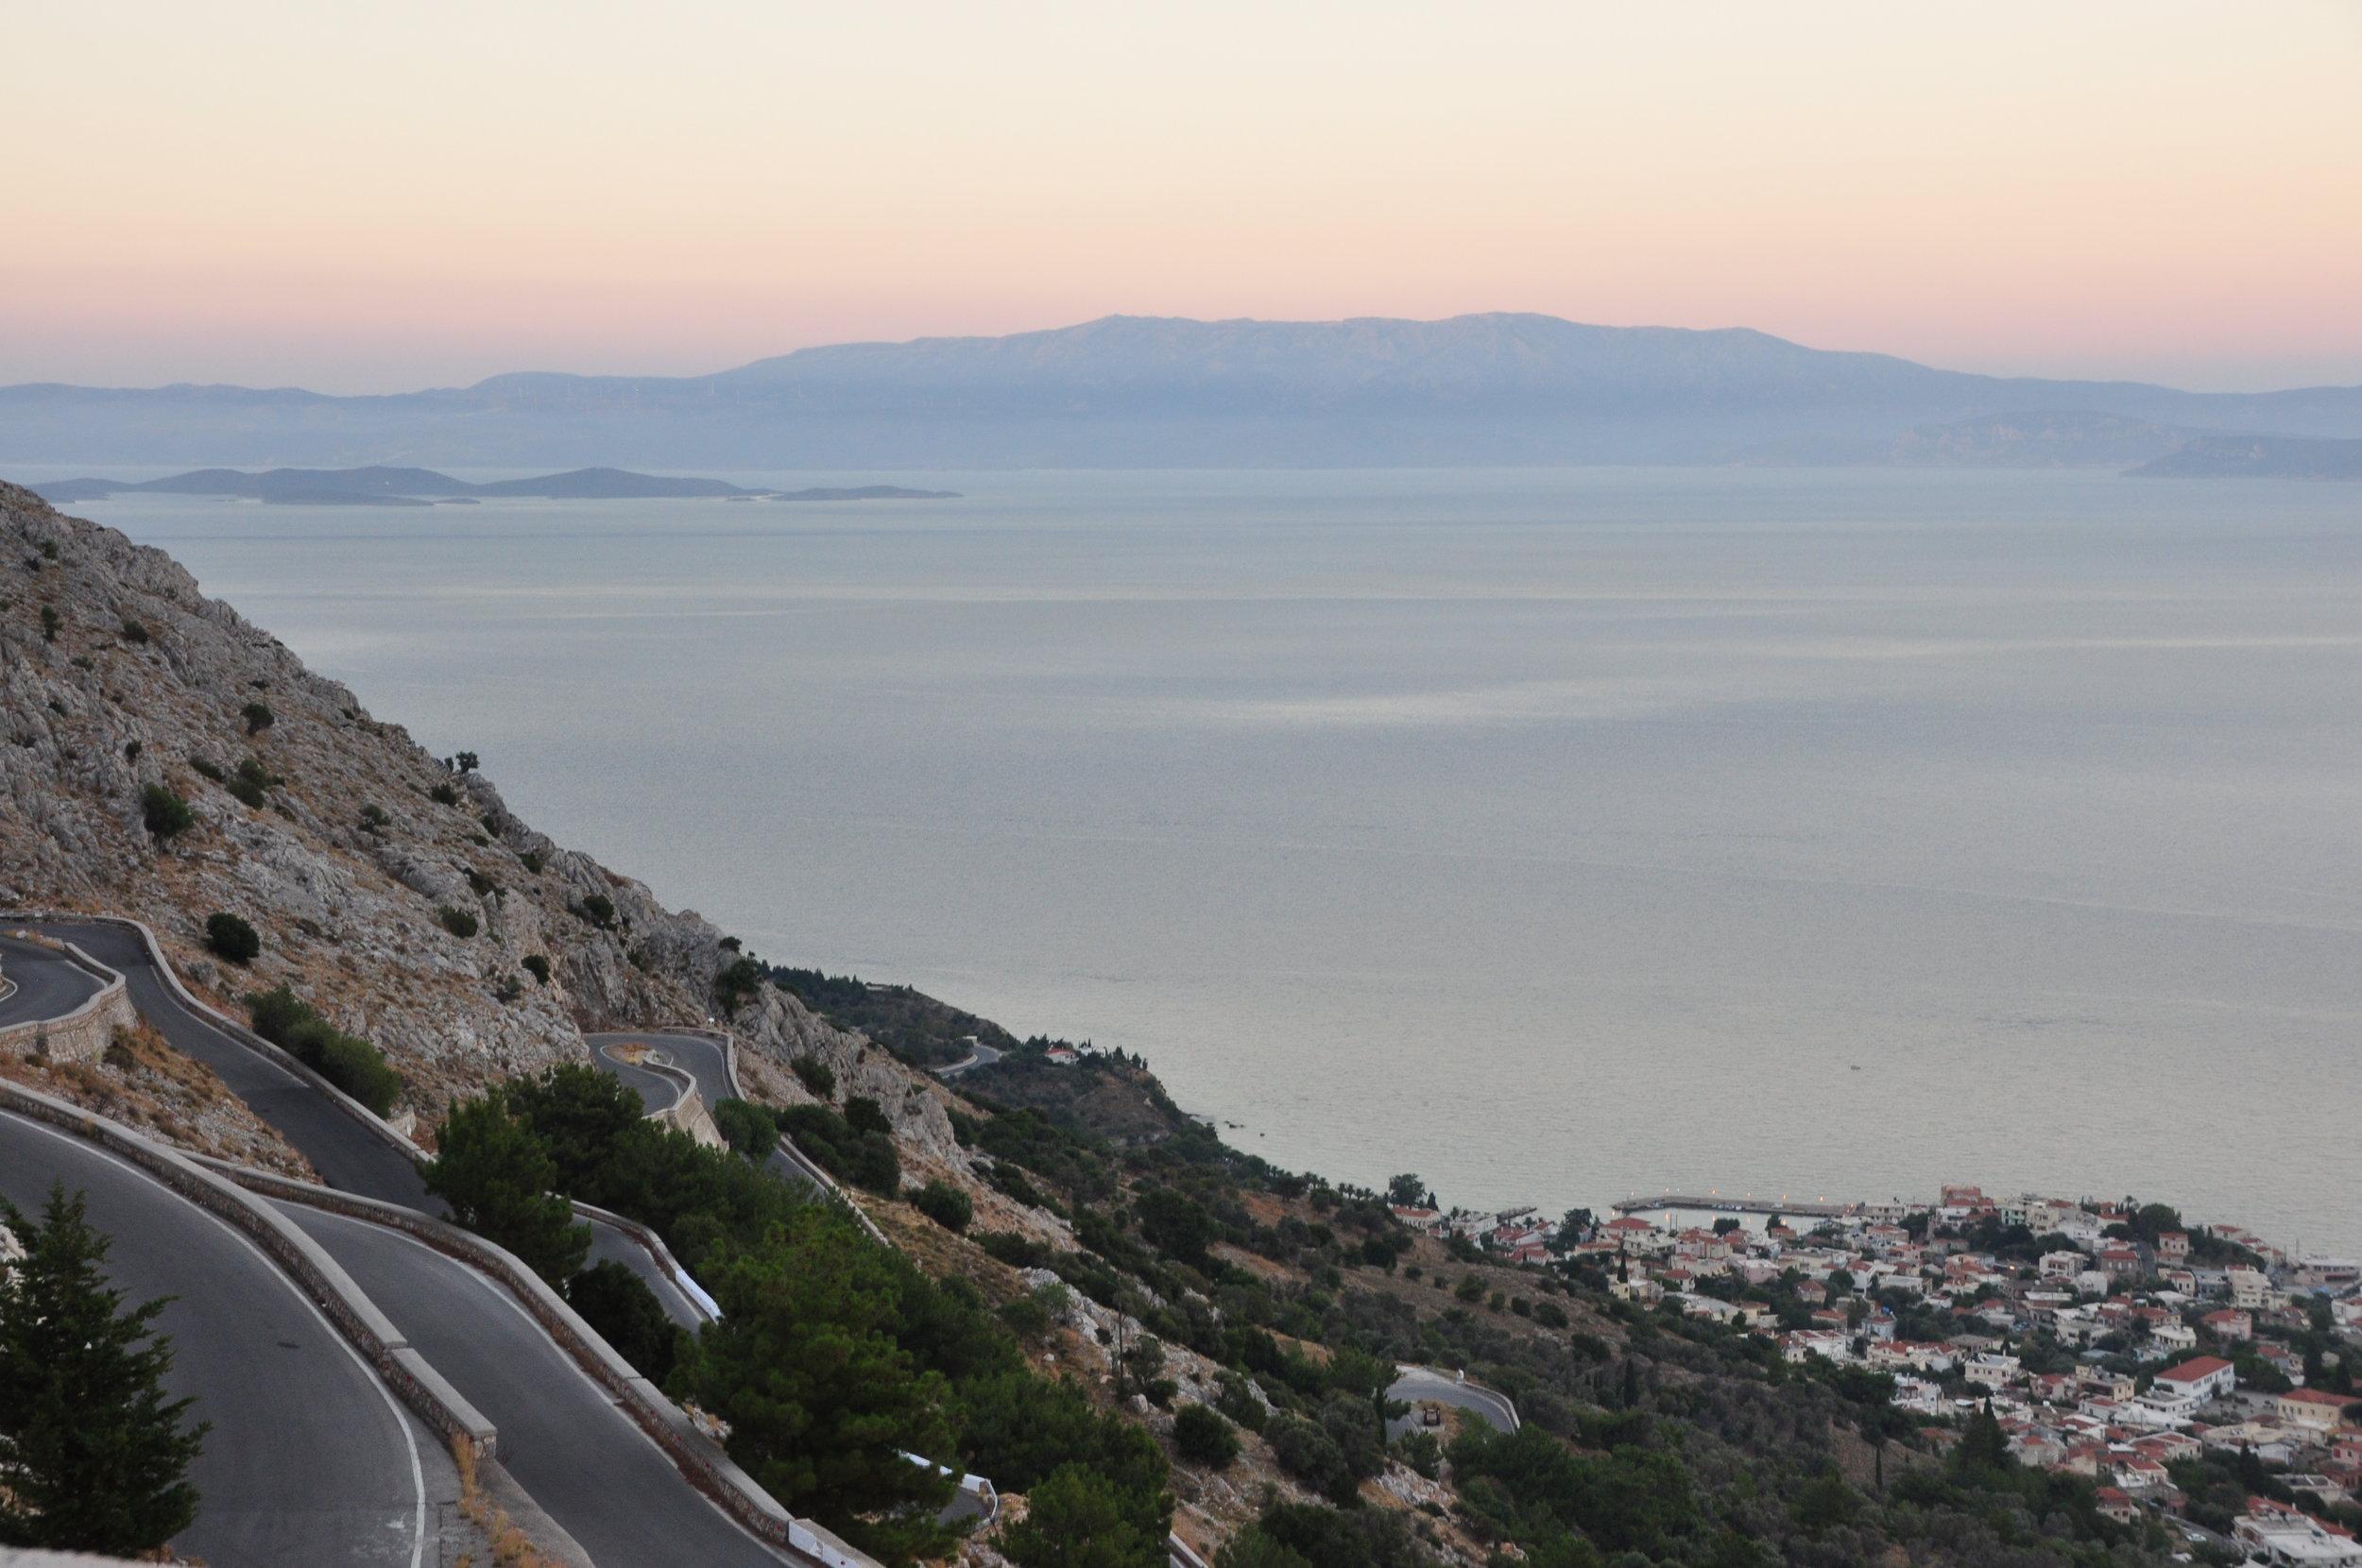 The east coast of Chios island